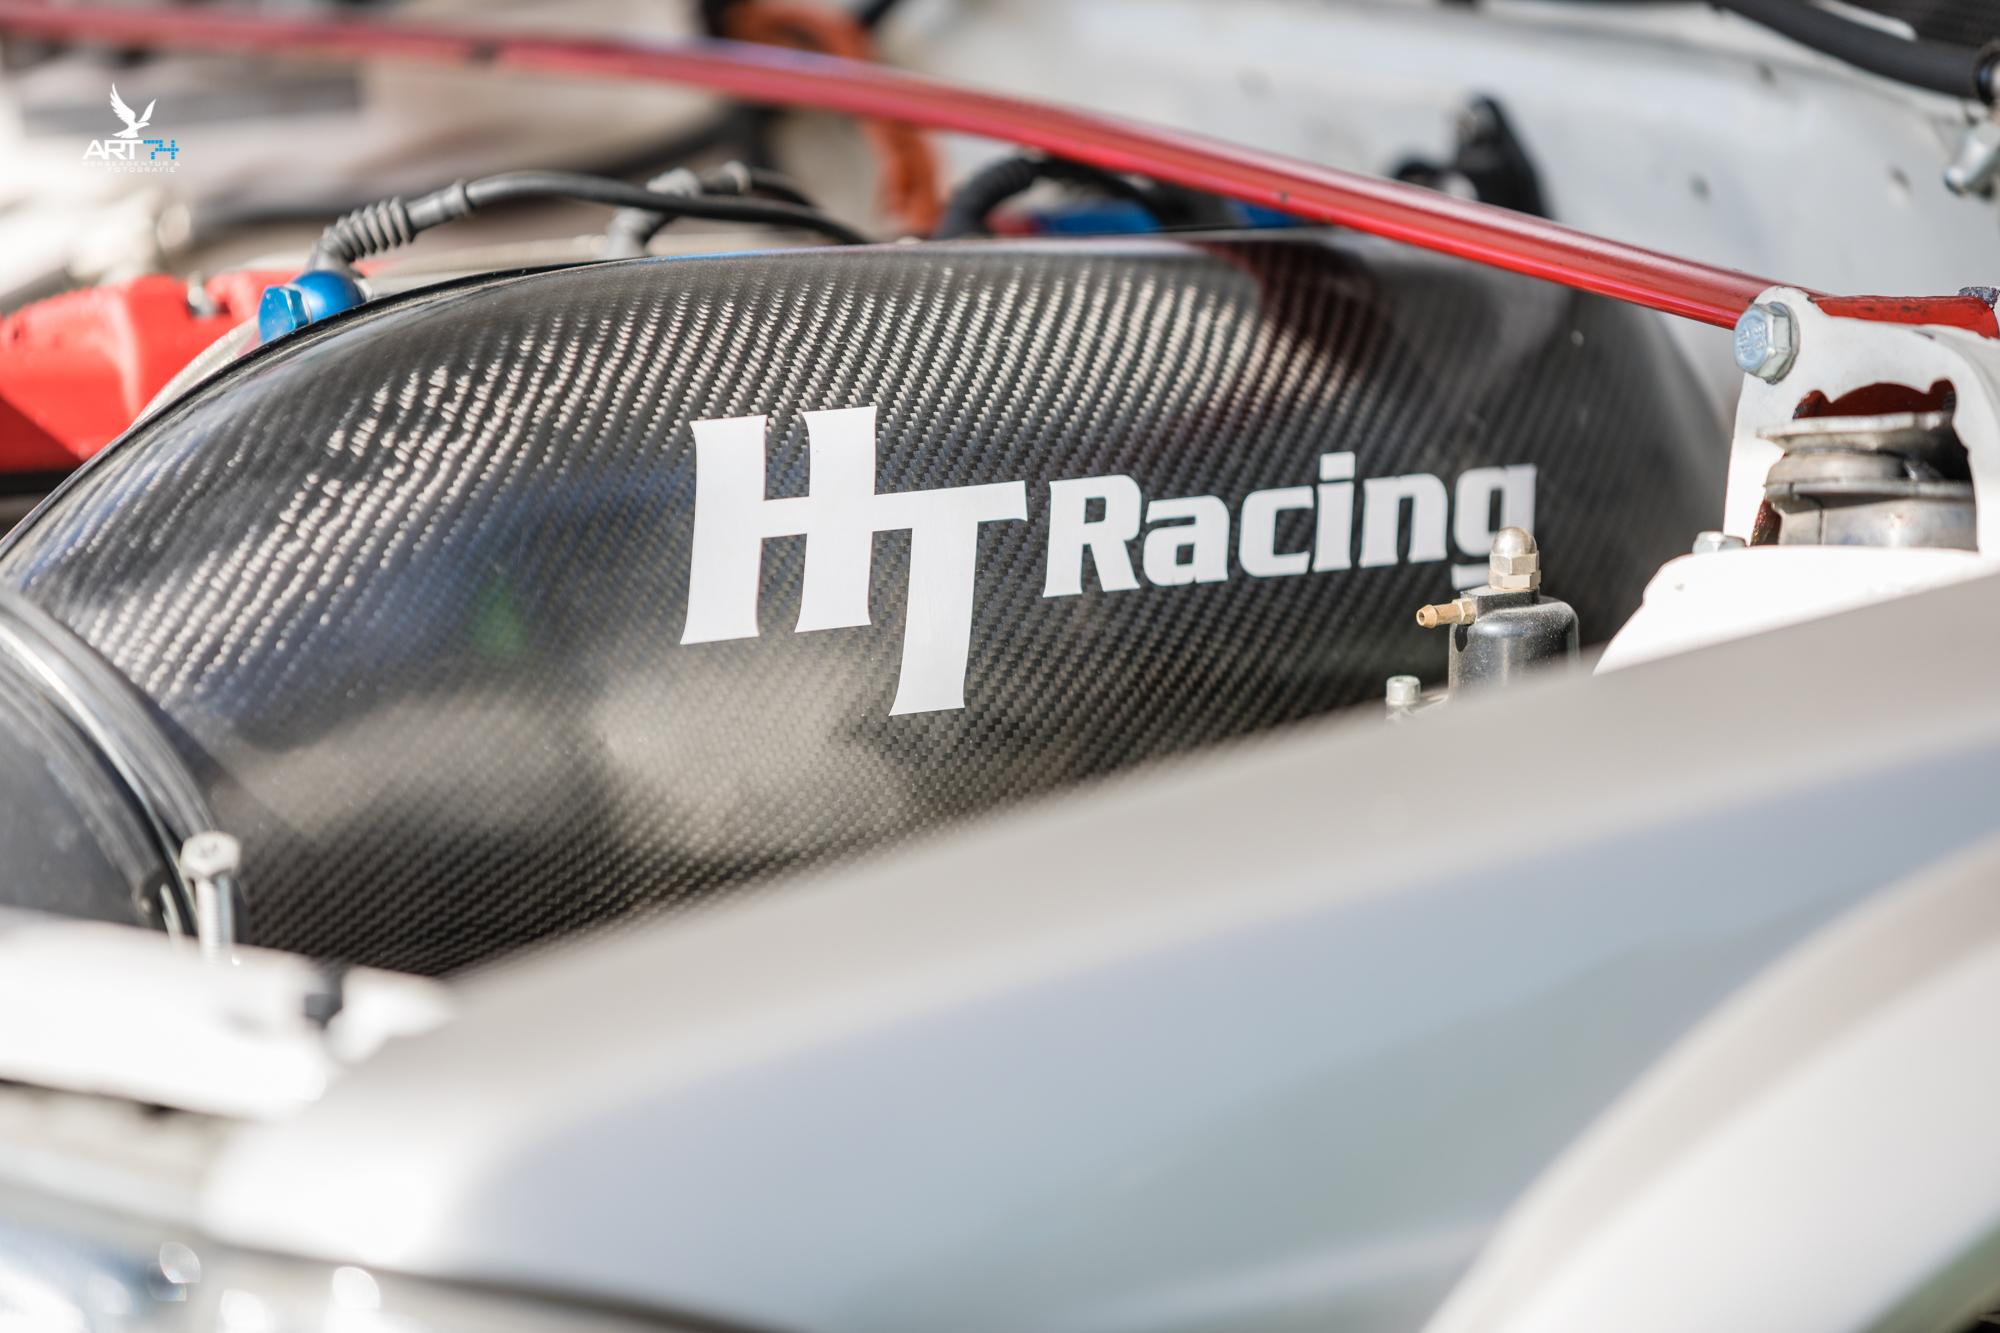 HT_Racing_0498_web